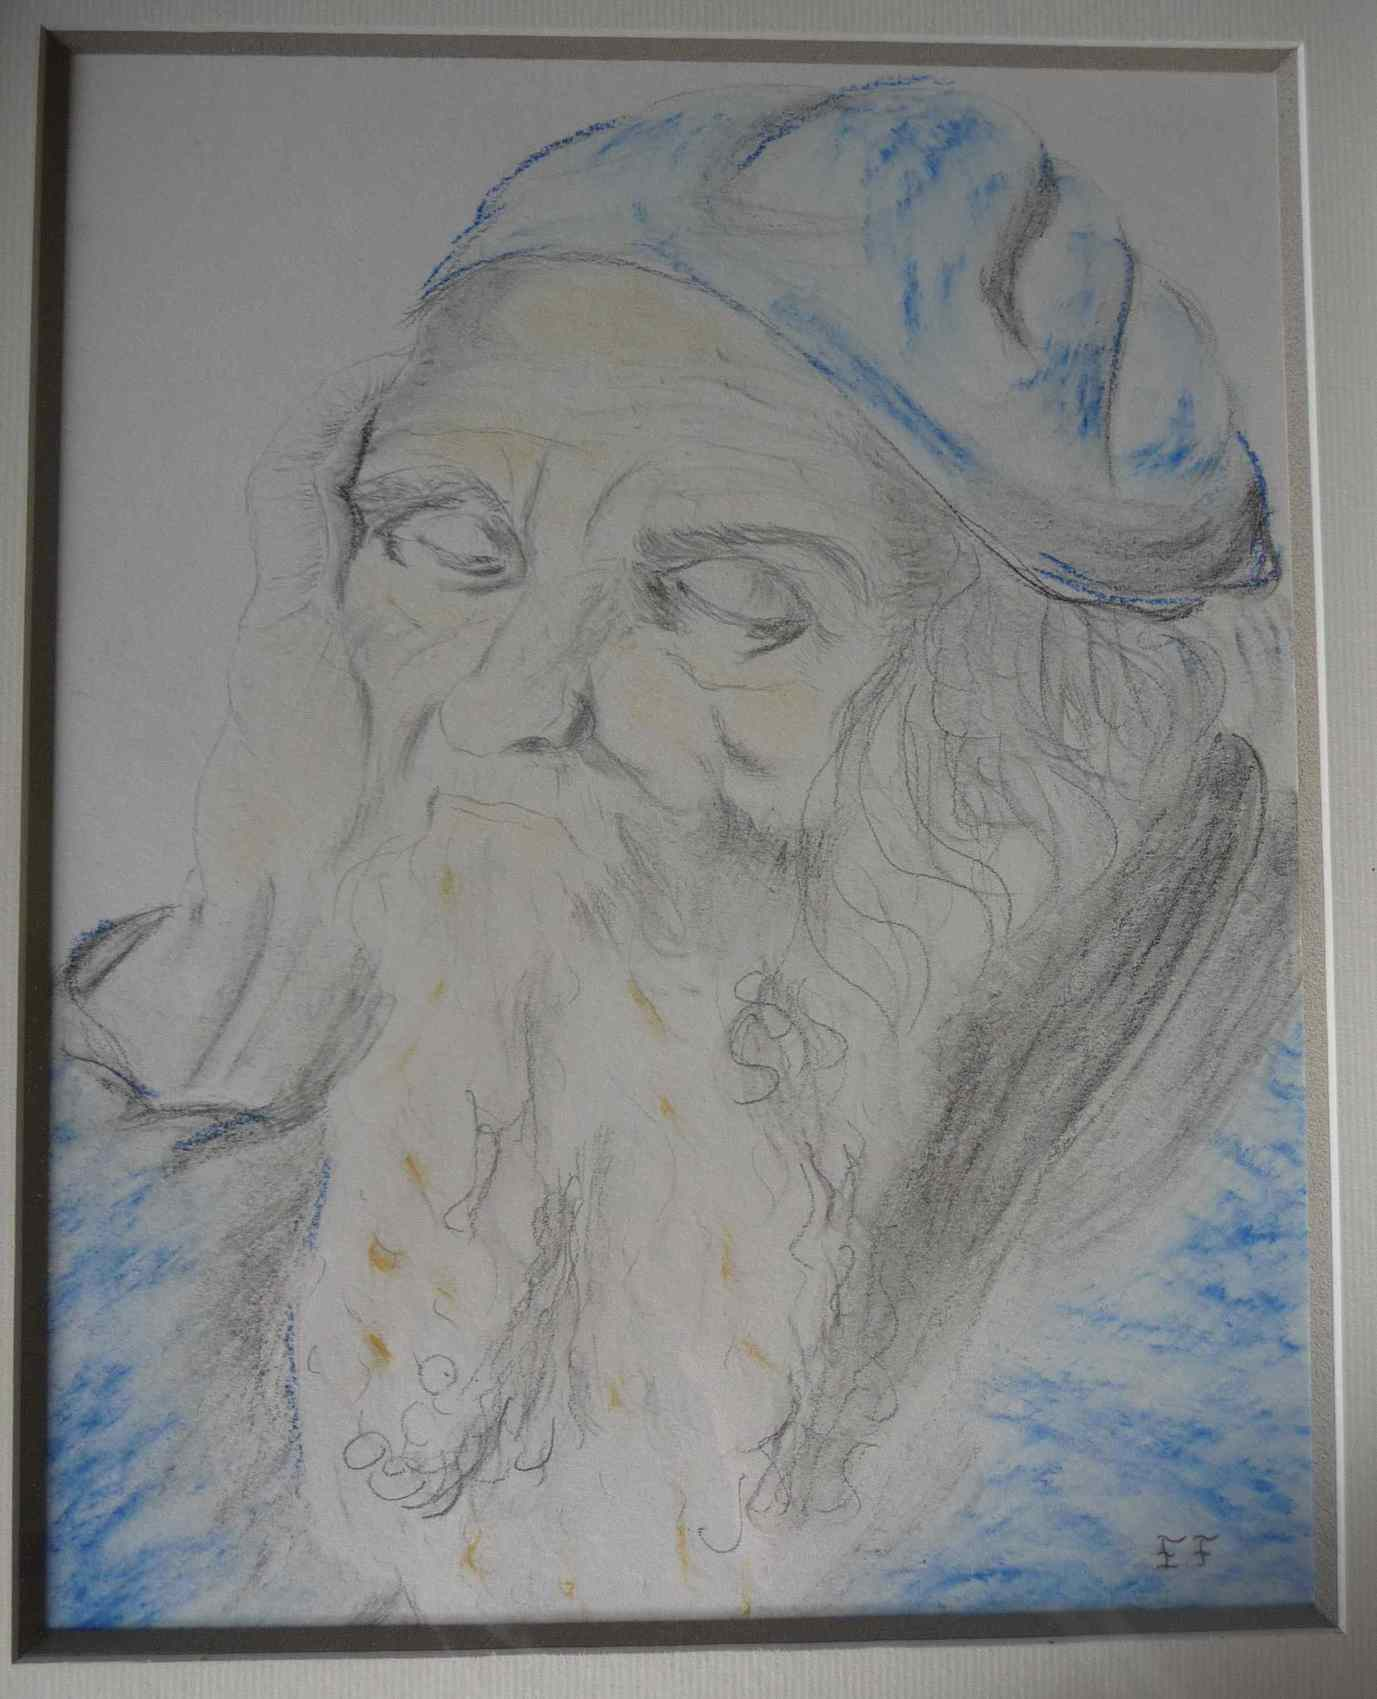 L'Ancien d'après Dürer